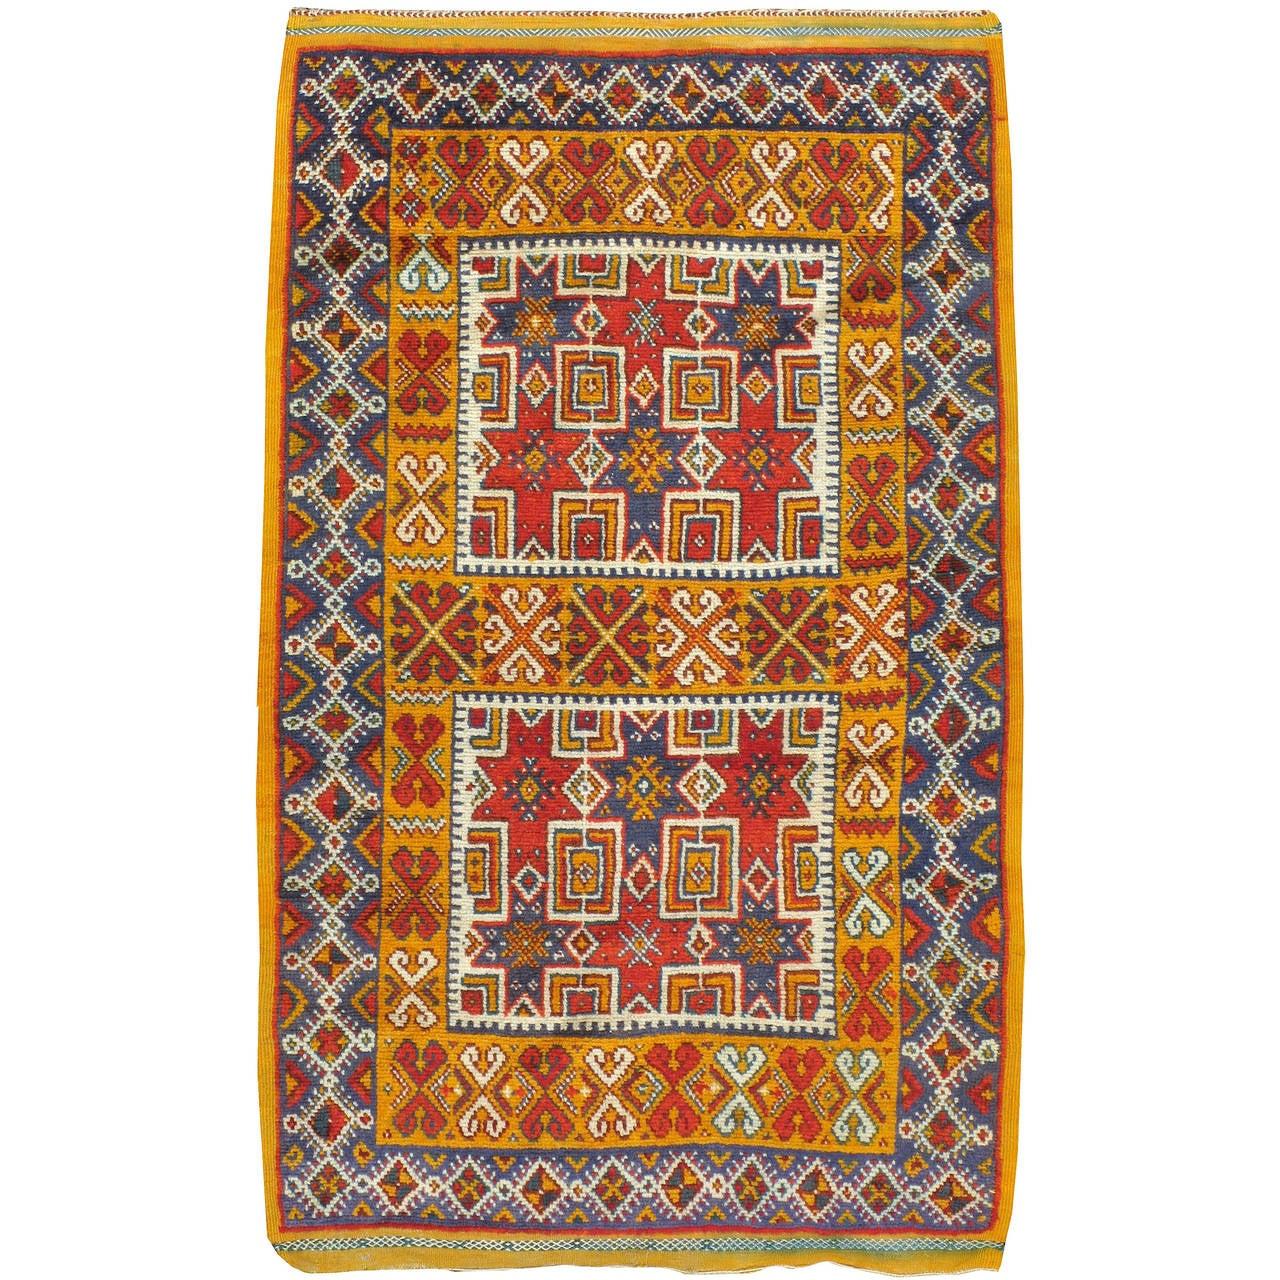 Modern Moroccan Rug For Sale At 1stdibs